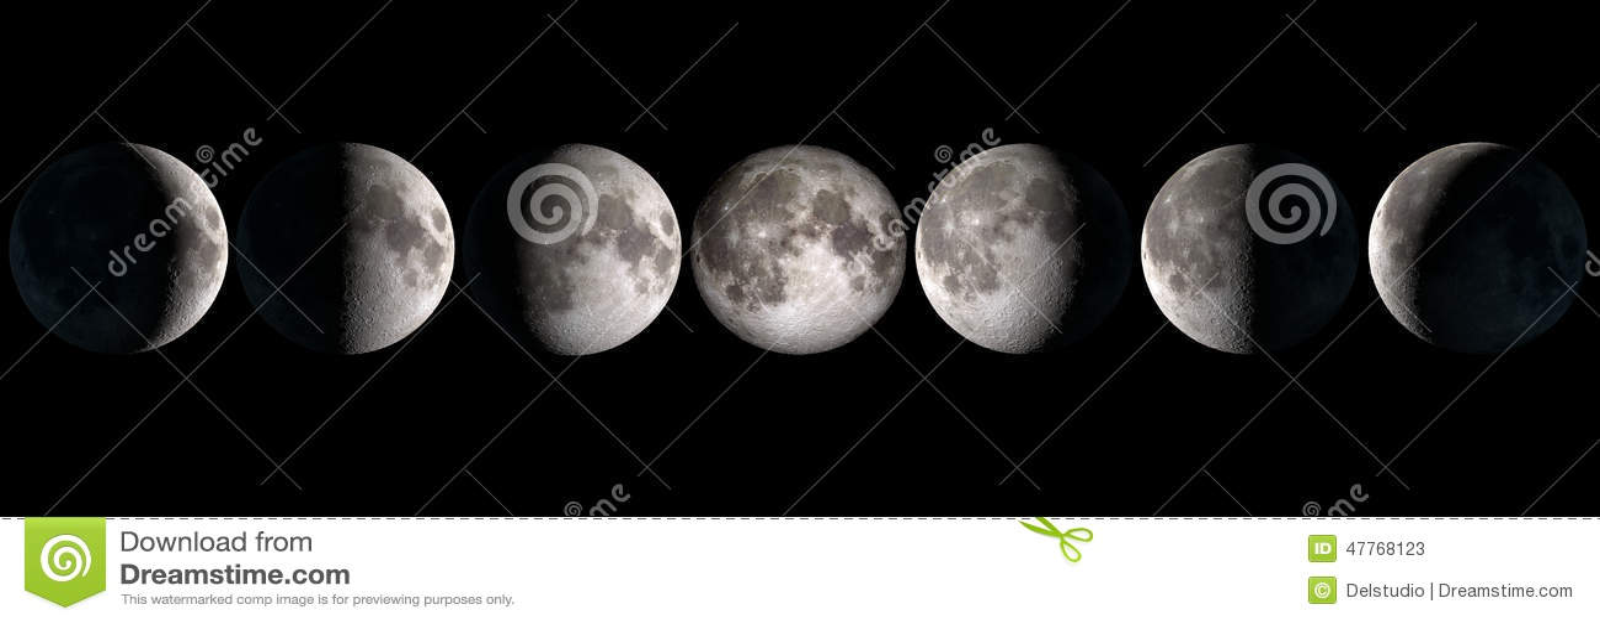 Månen synkroniserar collage